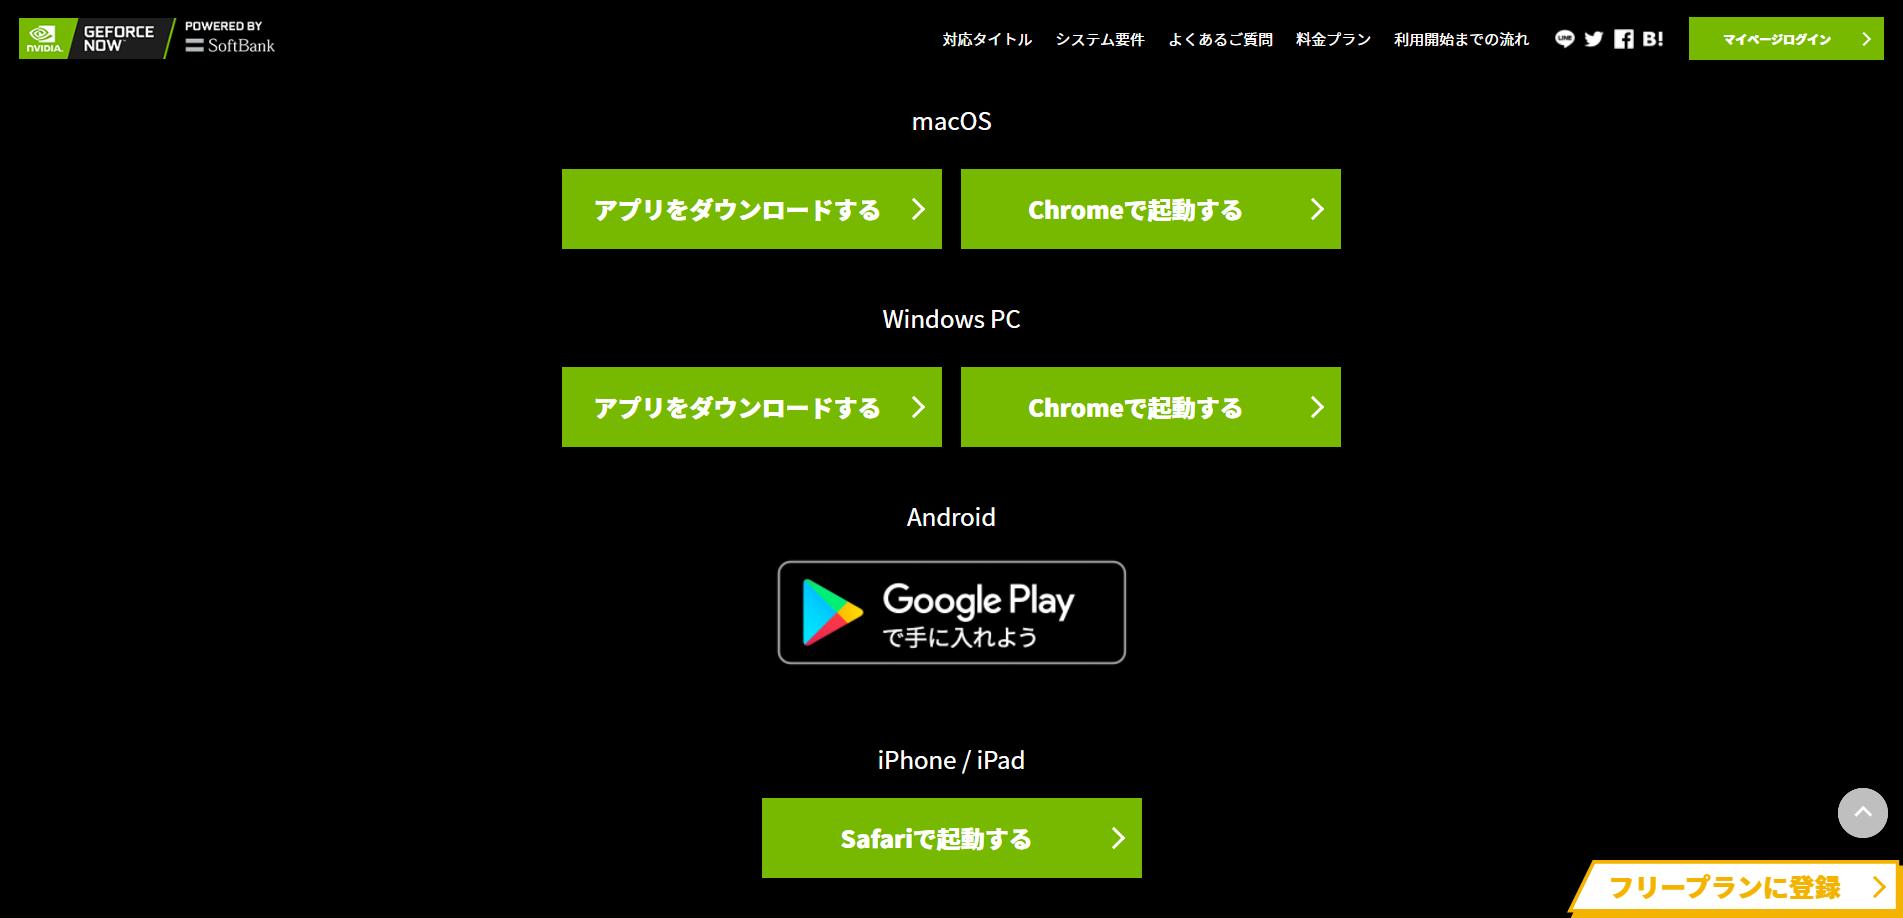 GeForce-NOWアプリダウンロード|GeForce-NOW-Powered-by-SoftBank